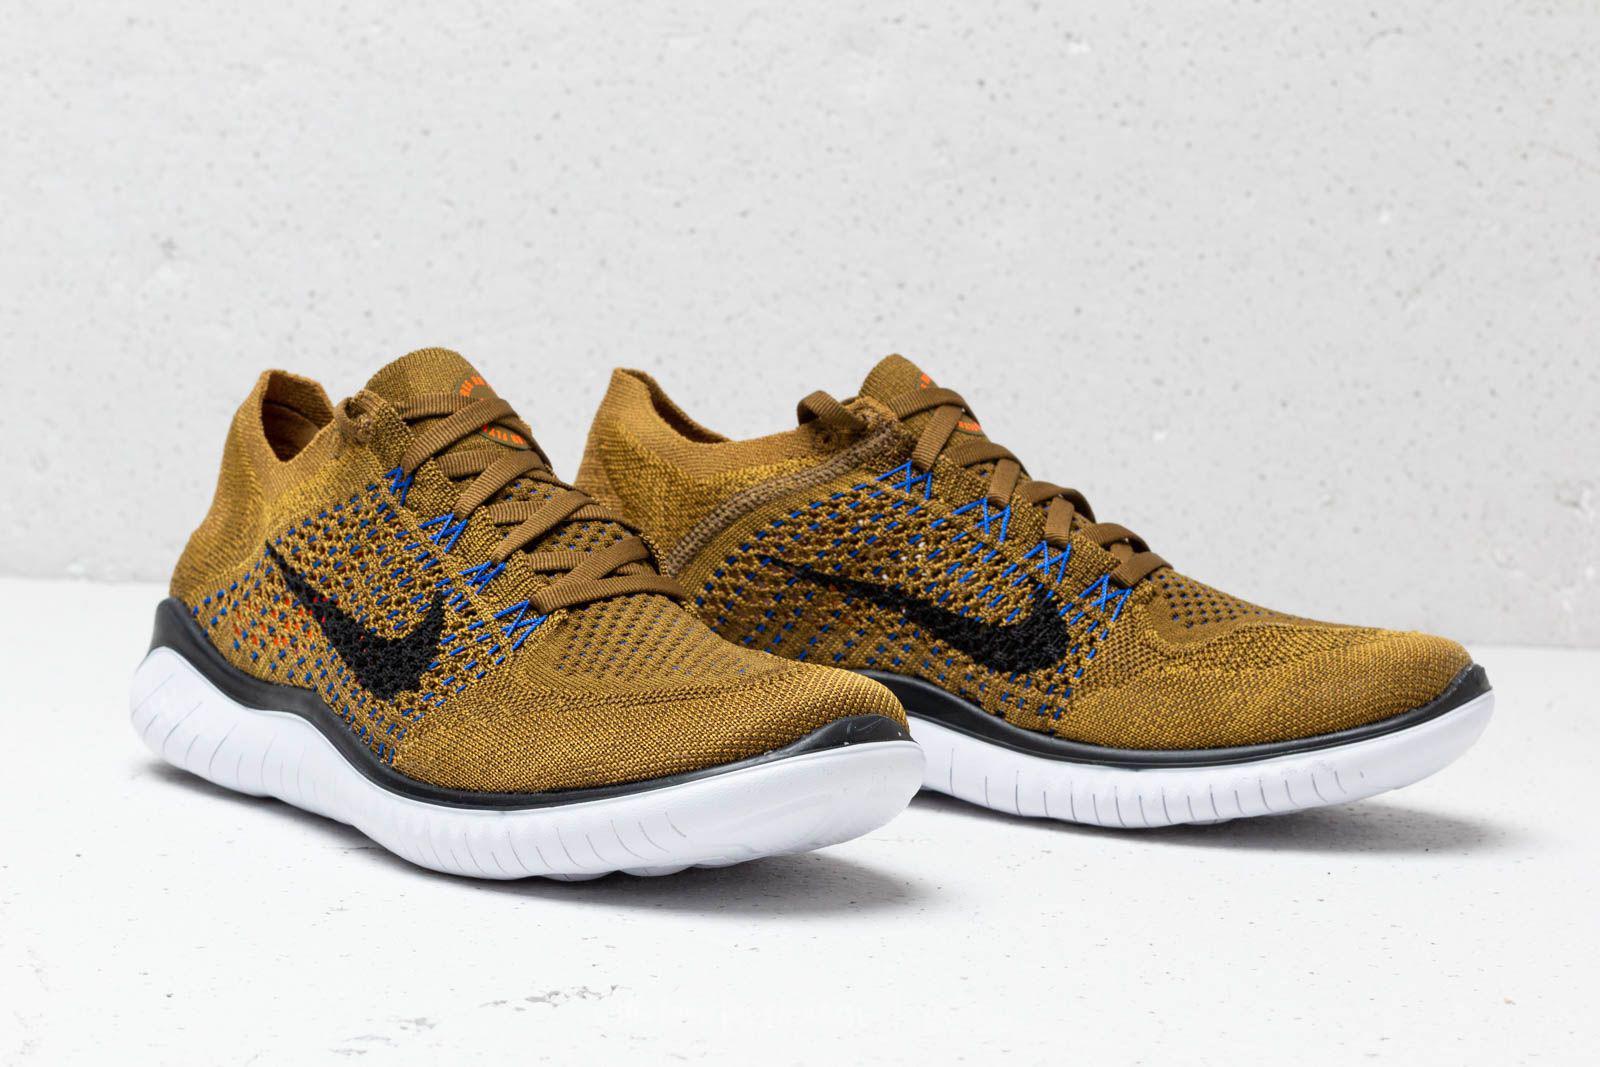 f1430b9d8161 Lyst - Nike Free Run Flyknit 2018 Olive Flak  Black-desert Moss for Men